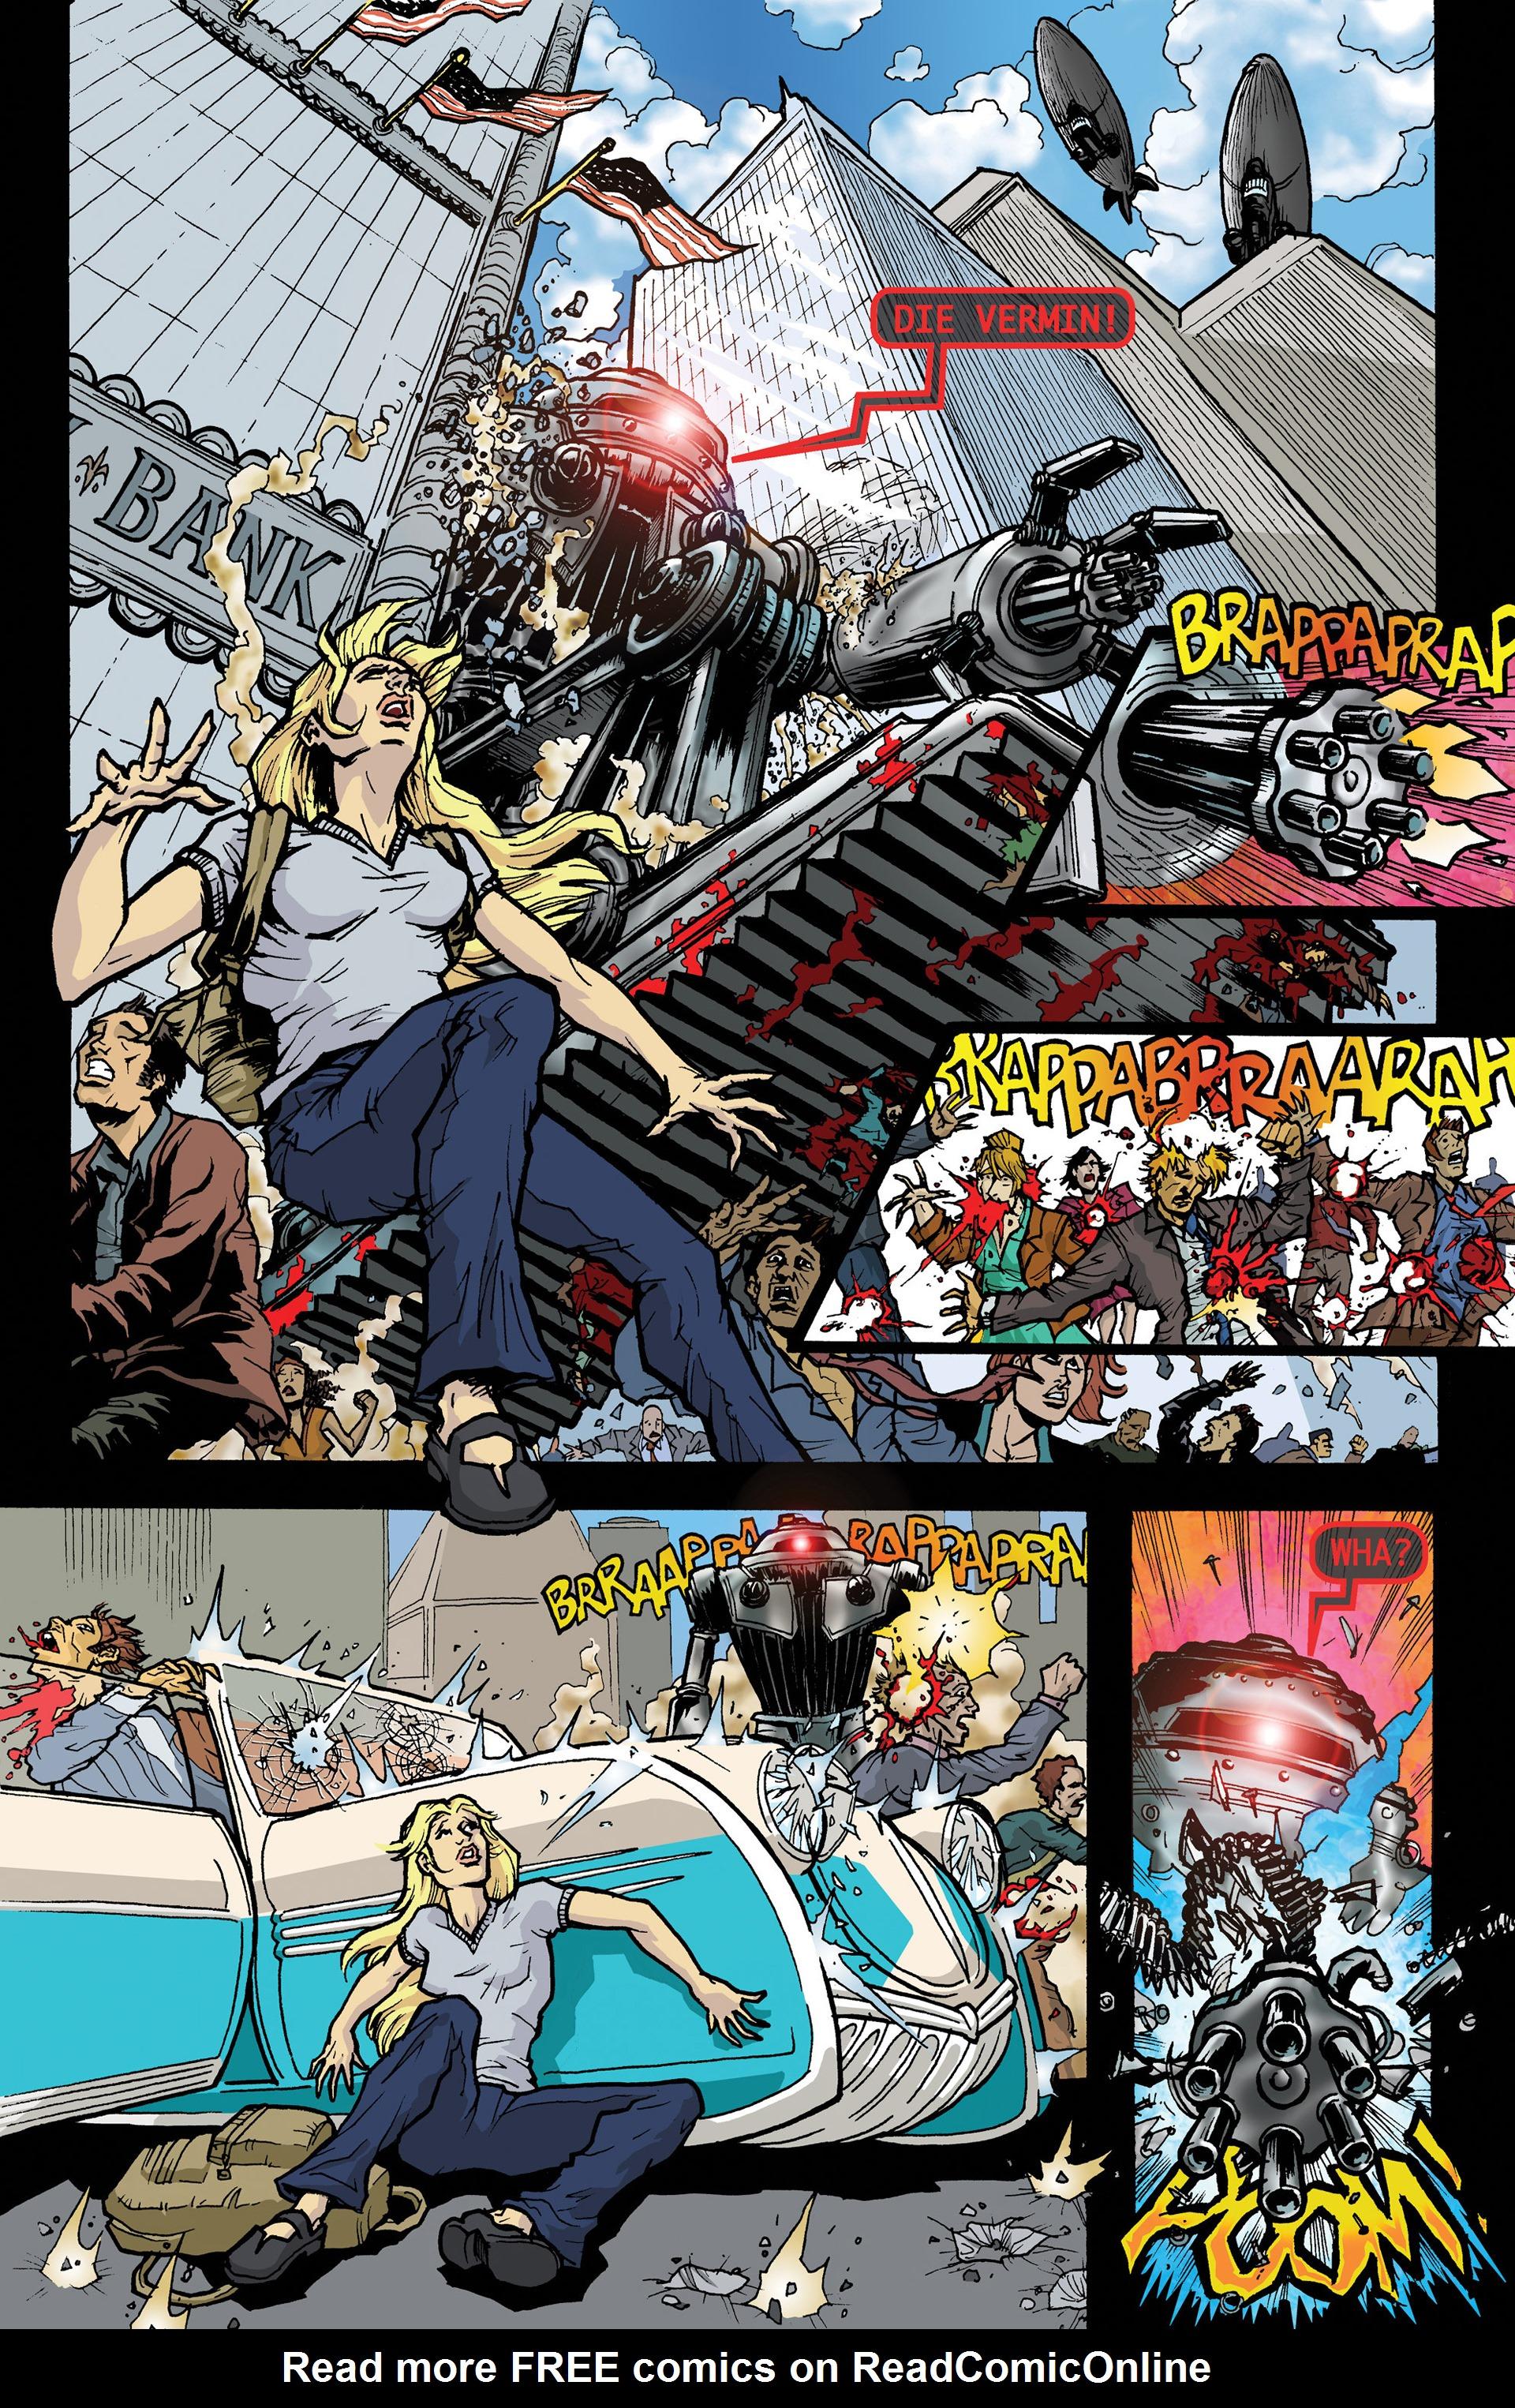 Read online Birth of Venus comic -  Issue #1 - 12